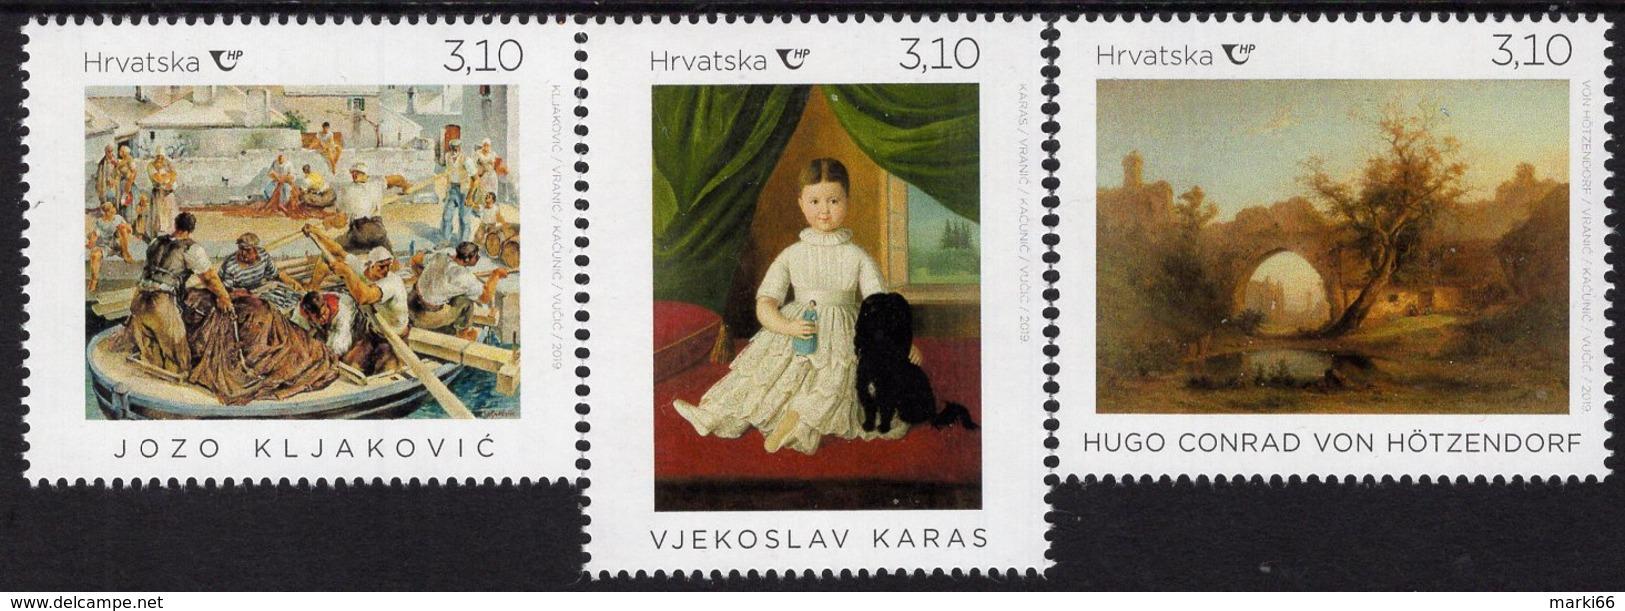 Croatia - 2019 - Fine Art On Stamps - Hoetzendorf, Karas, Kljakovic - Mint Stamp Set - Croatia